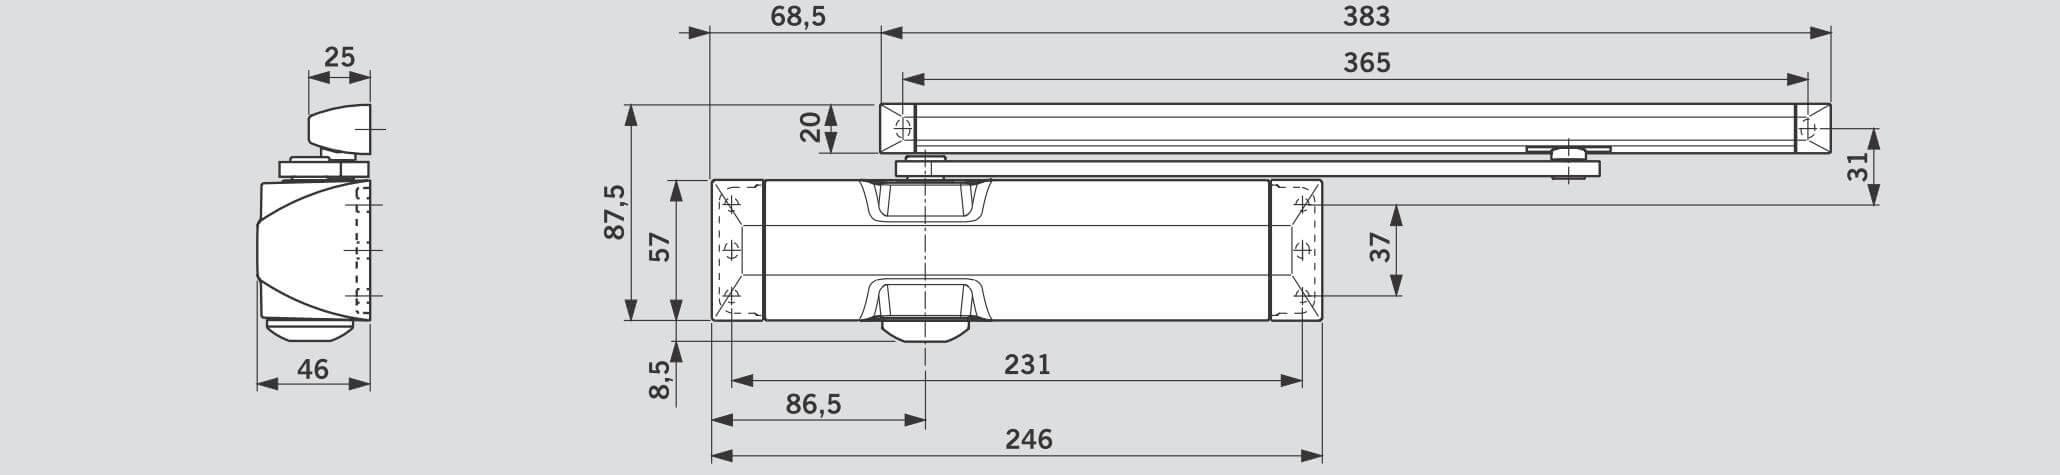 Схема дверного доводчика DORMA TS 90 Impulse